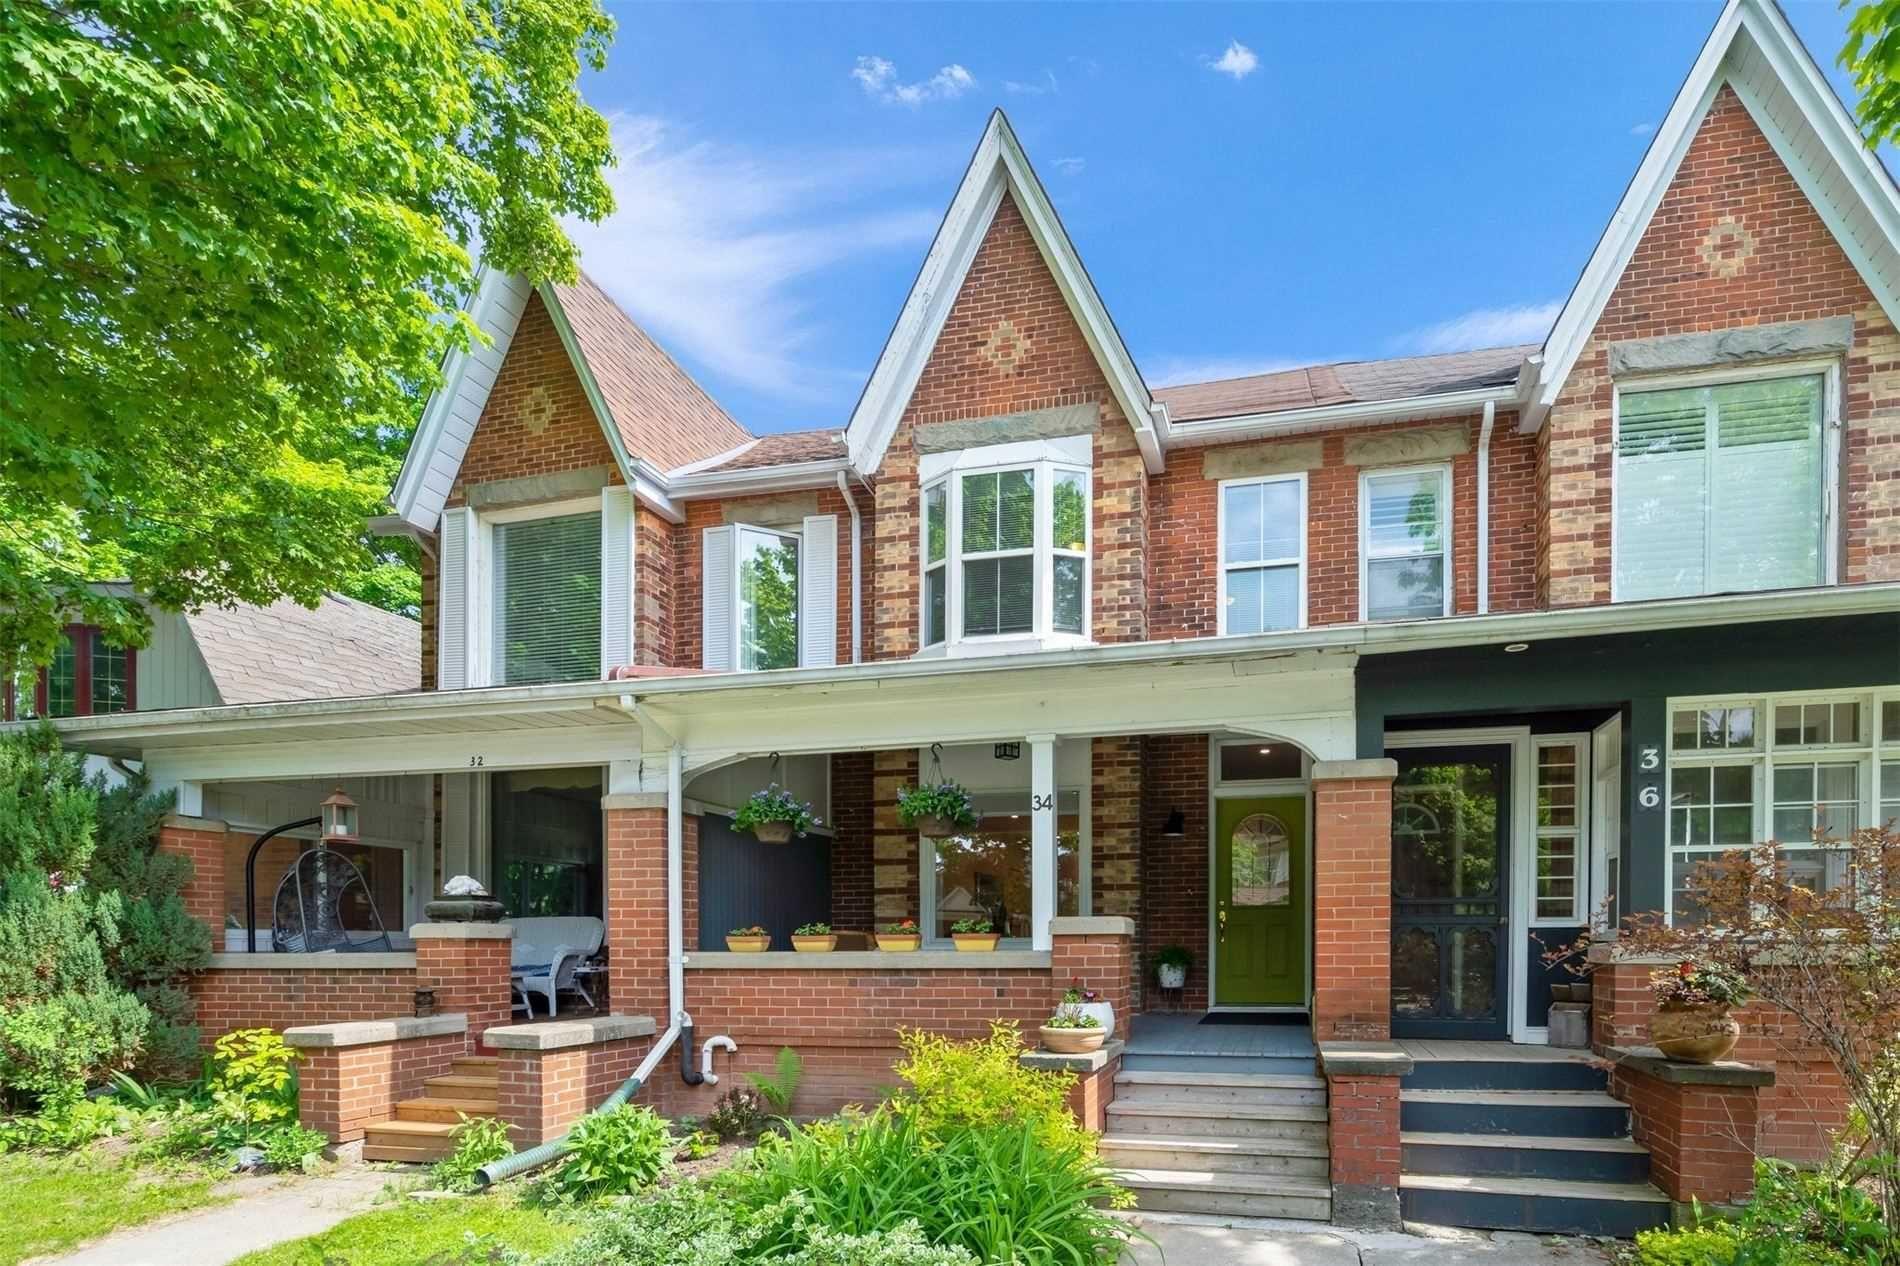 Main Photo: 34 Zina Street: Orangeville House (2-Storey) for sale : MLS®# W5262899